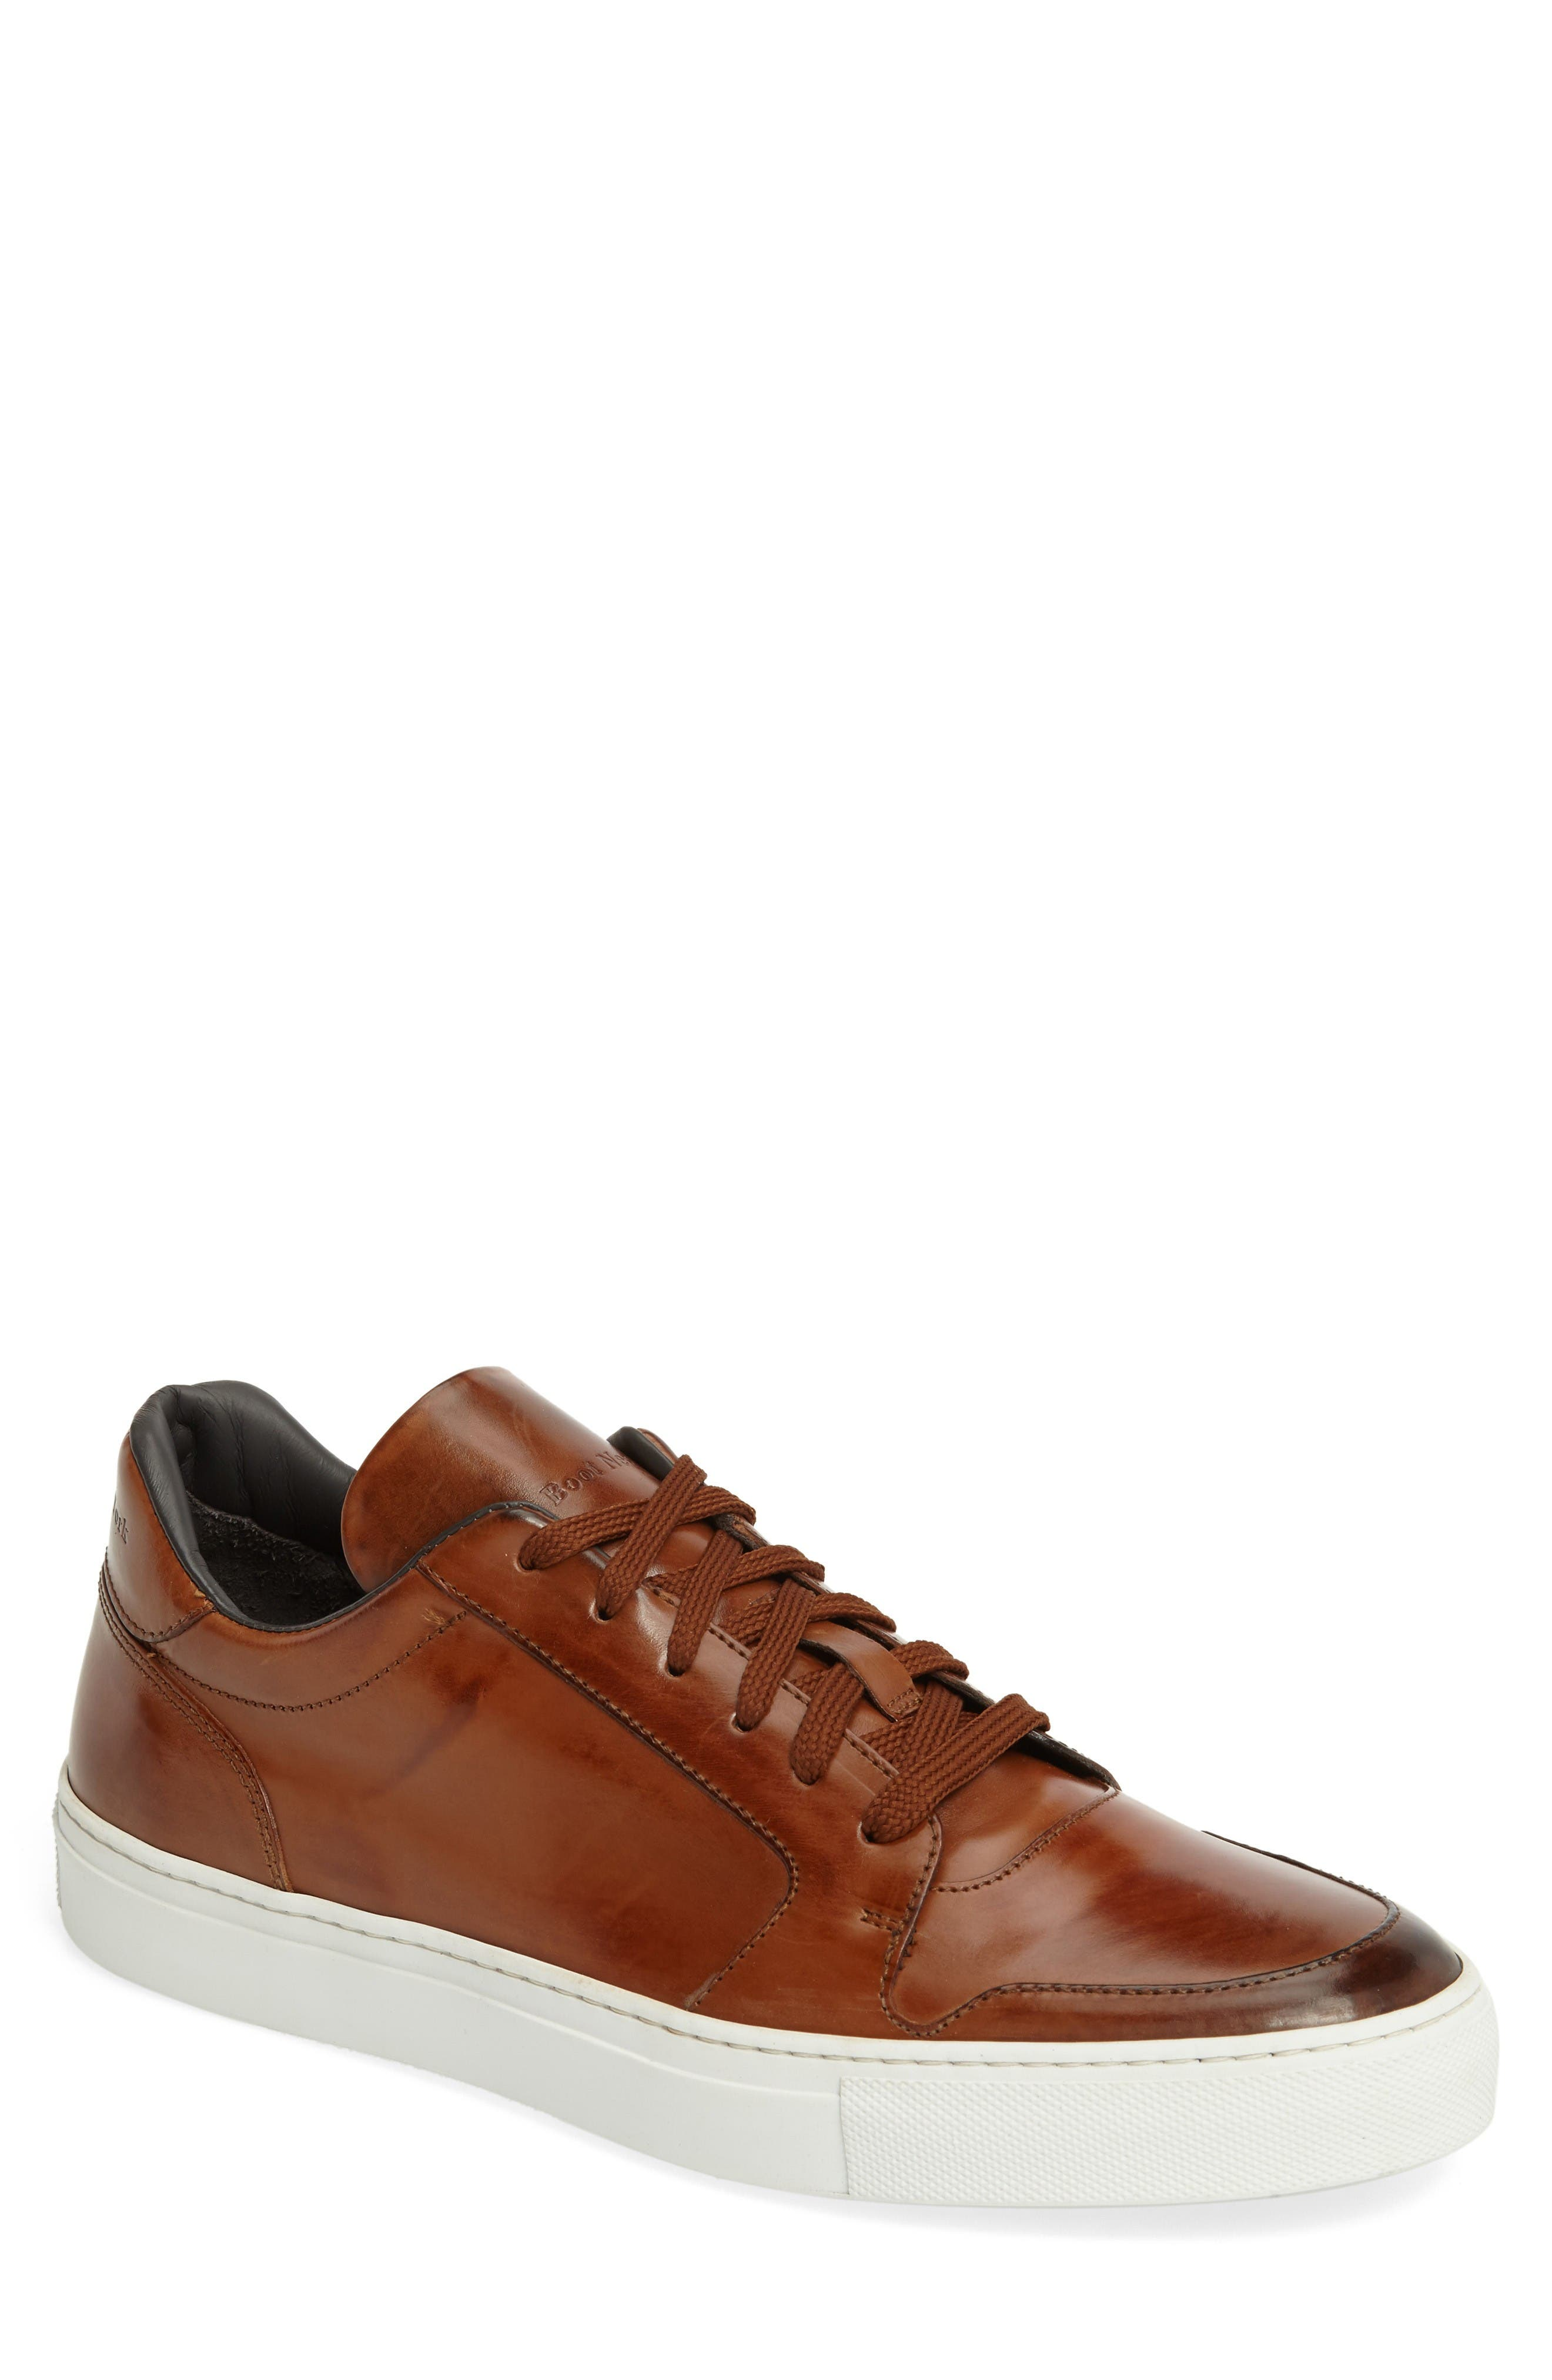 Alternate Image 1 Selected - To Boot New York Calvin Sneaker (Men)